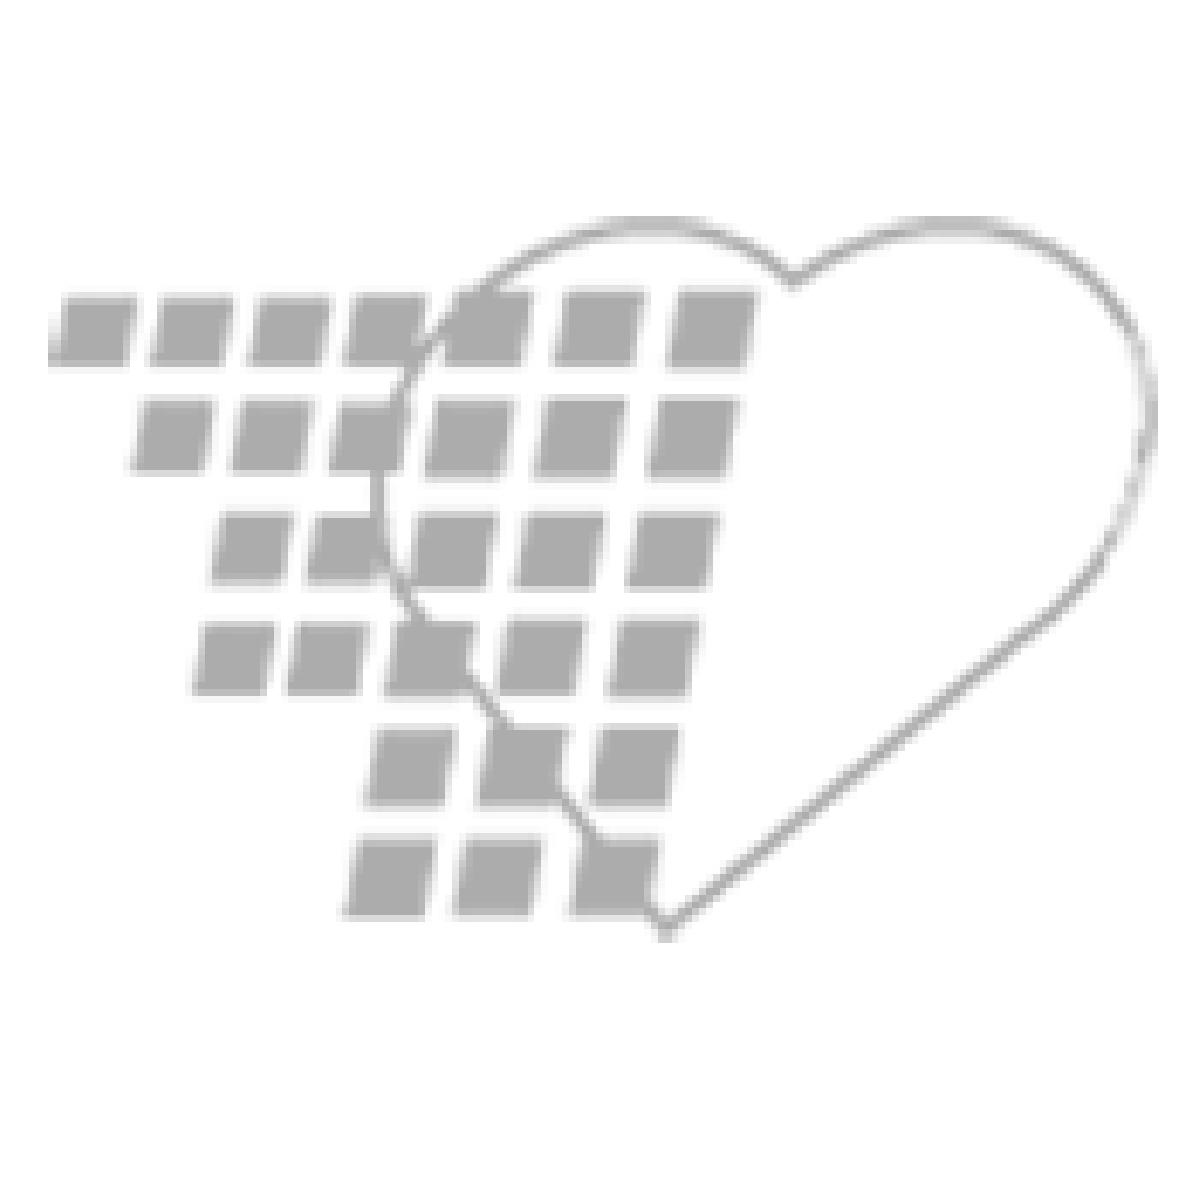 06-93-0073 - Demo Dose® Diflucn 150 mg - 100 Pills/Bottle